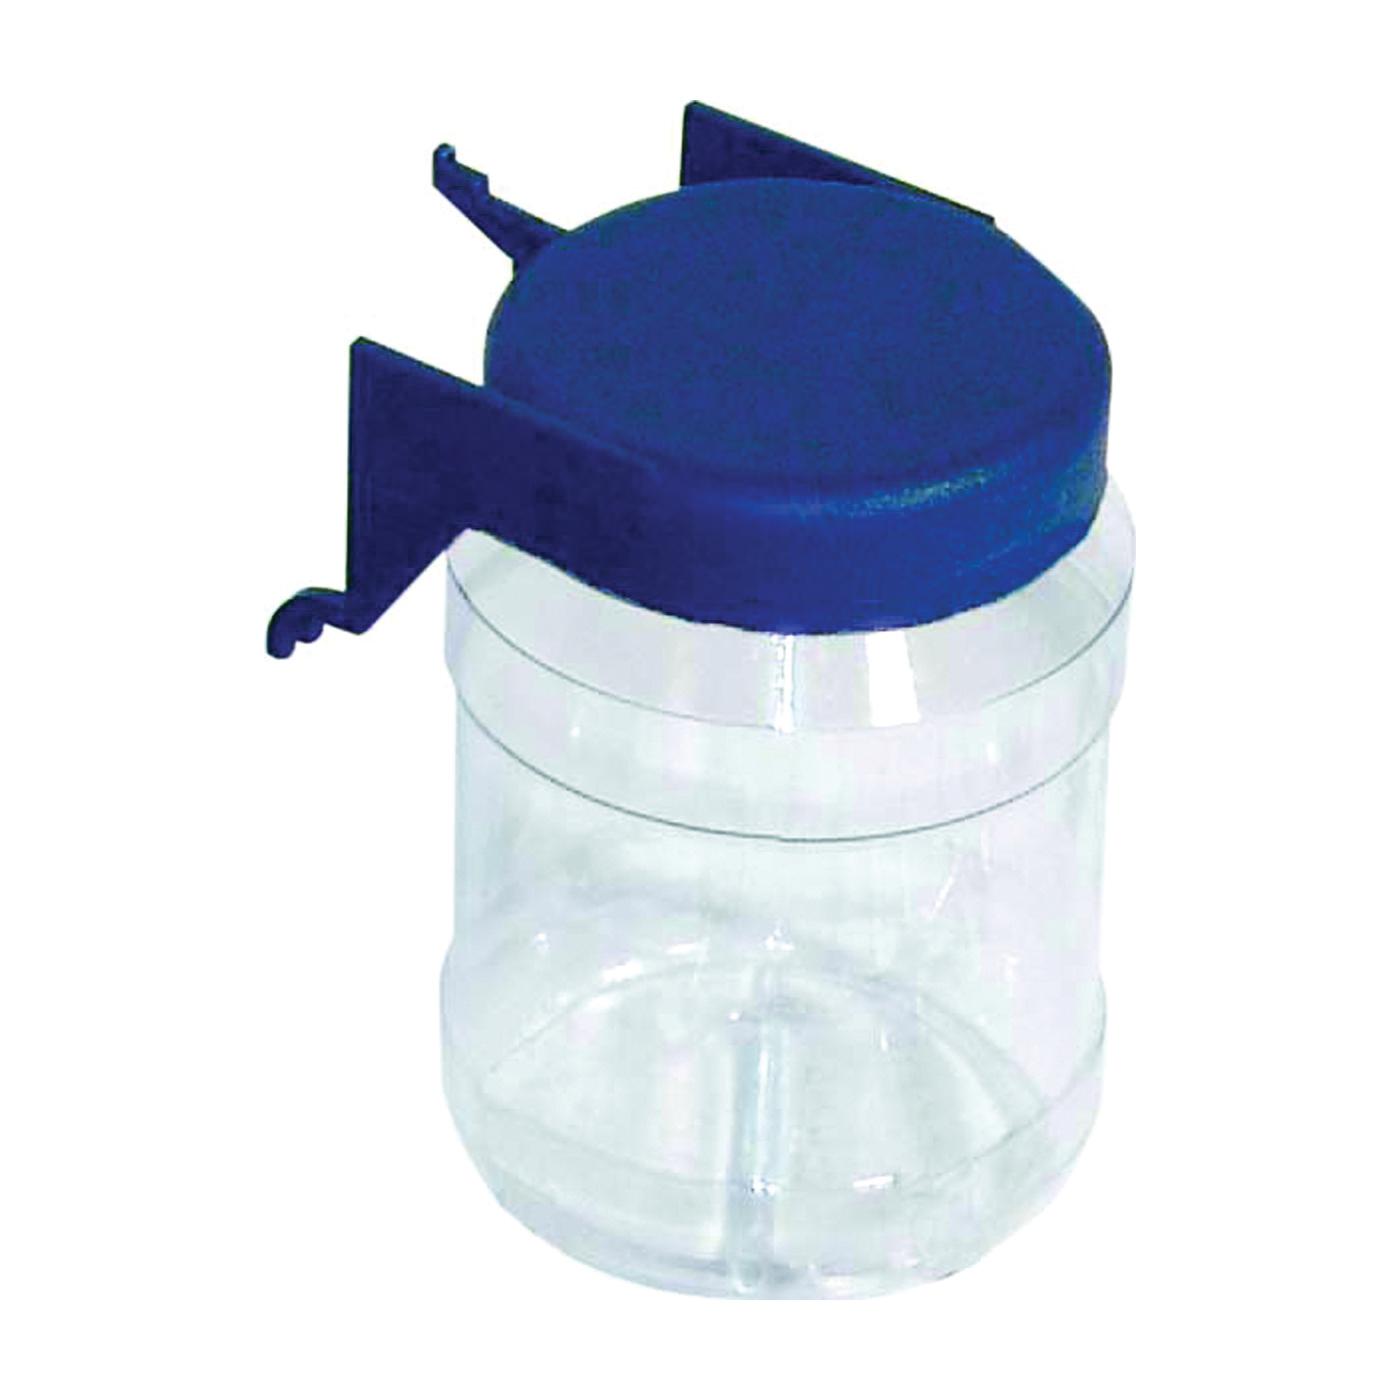 Picture of CRAWFORD JC12 Organizer Jar, 3 in L, 2 in W, 3-3/8 in H, Plastic, Clear